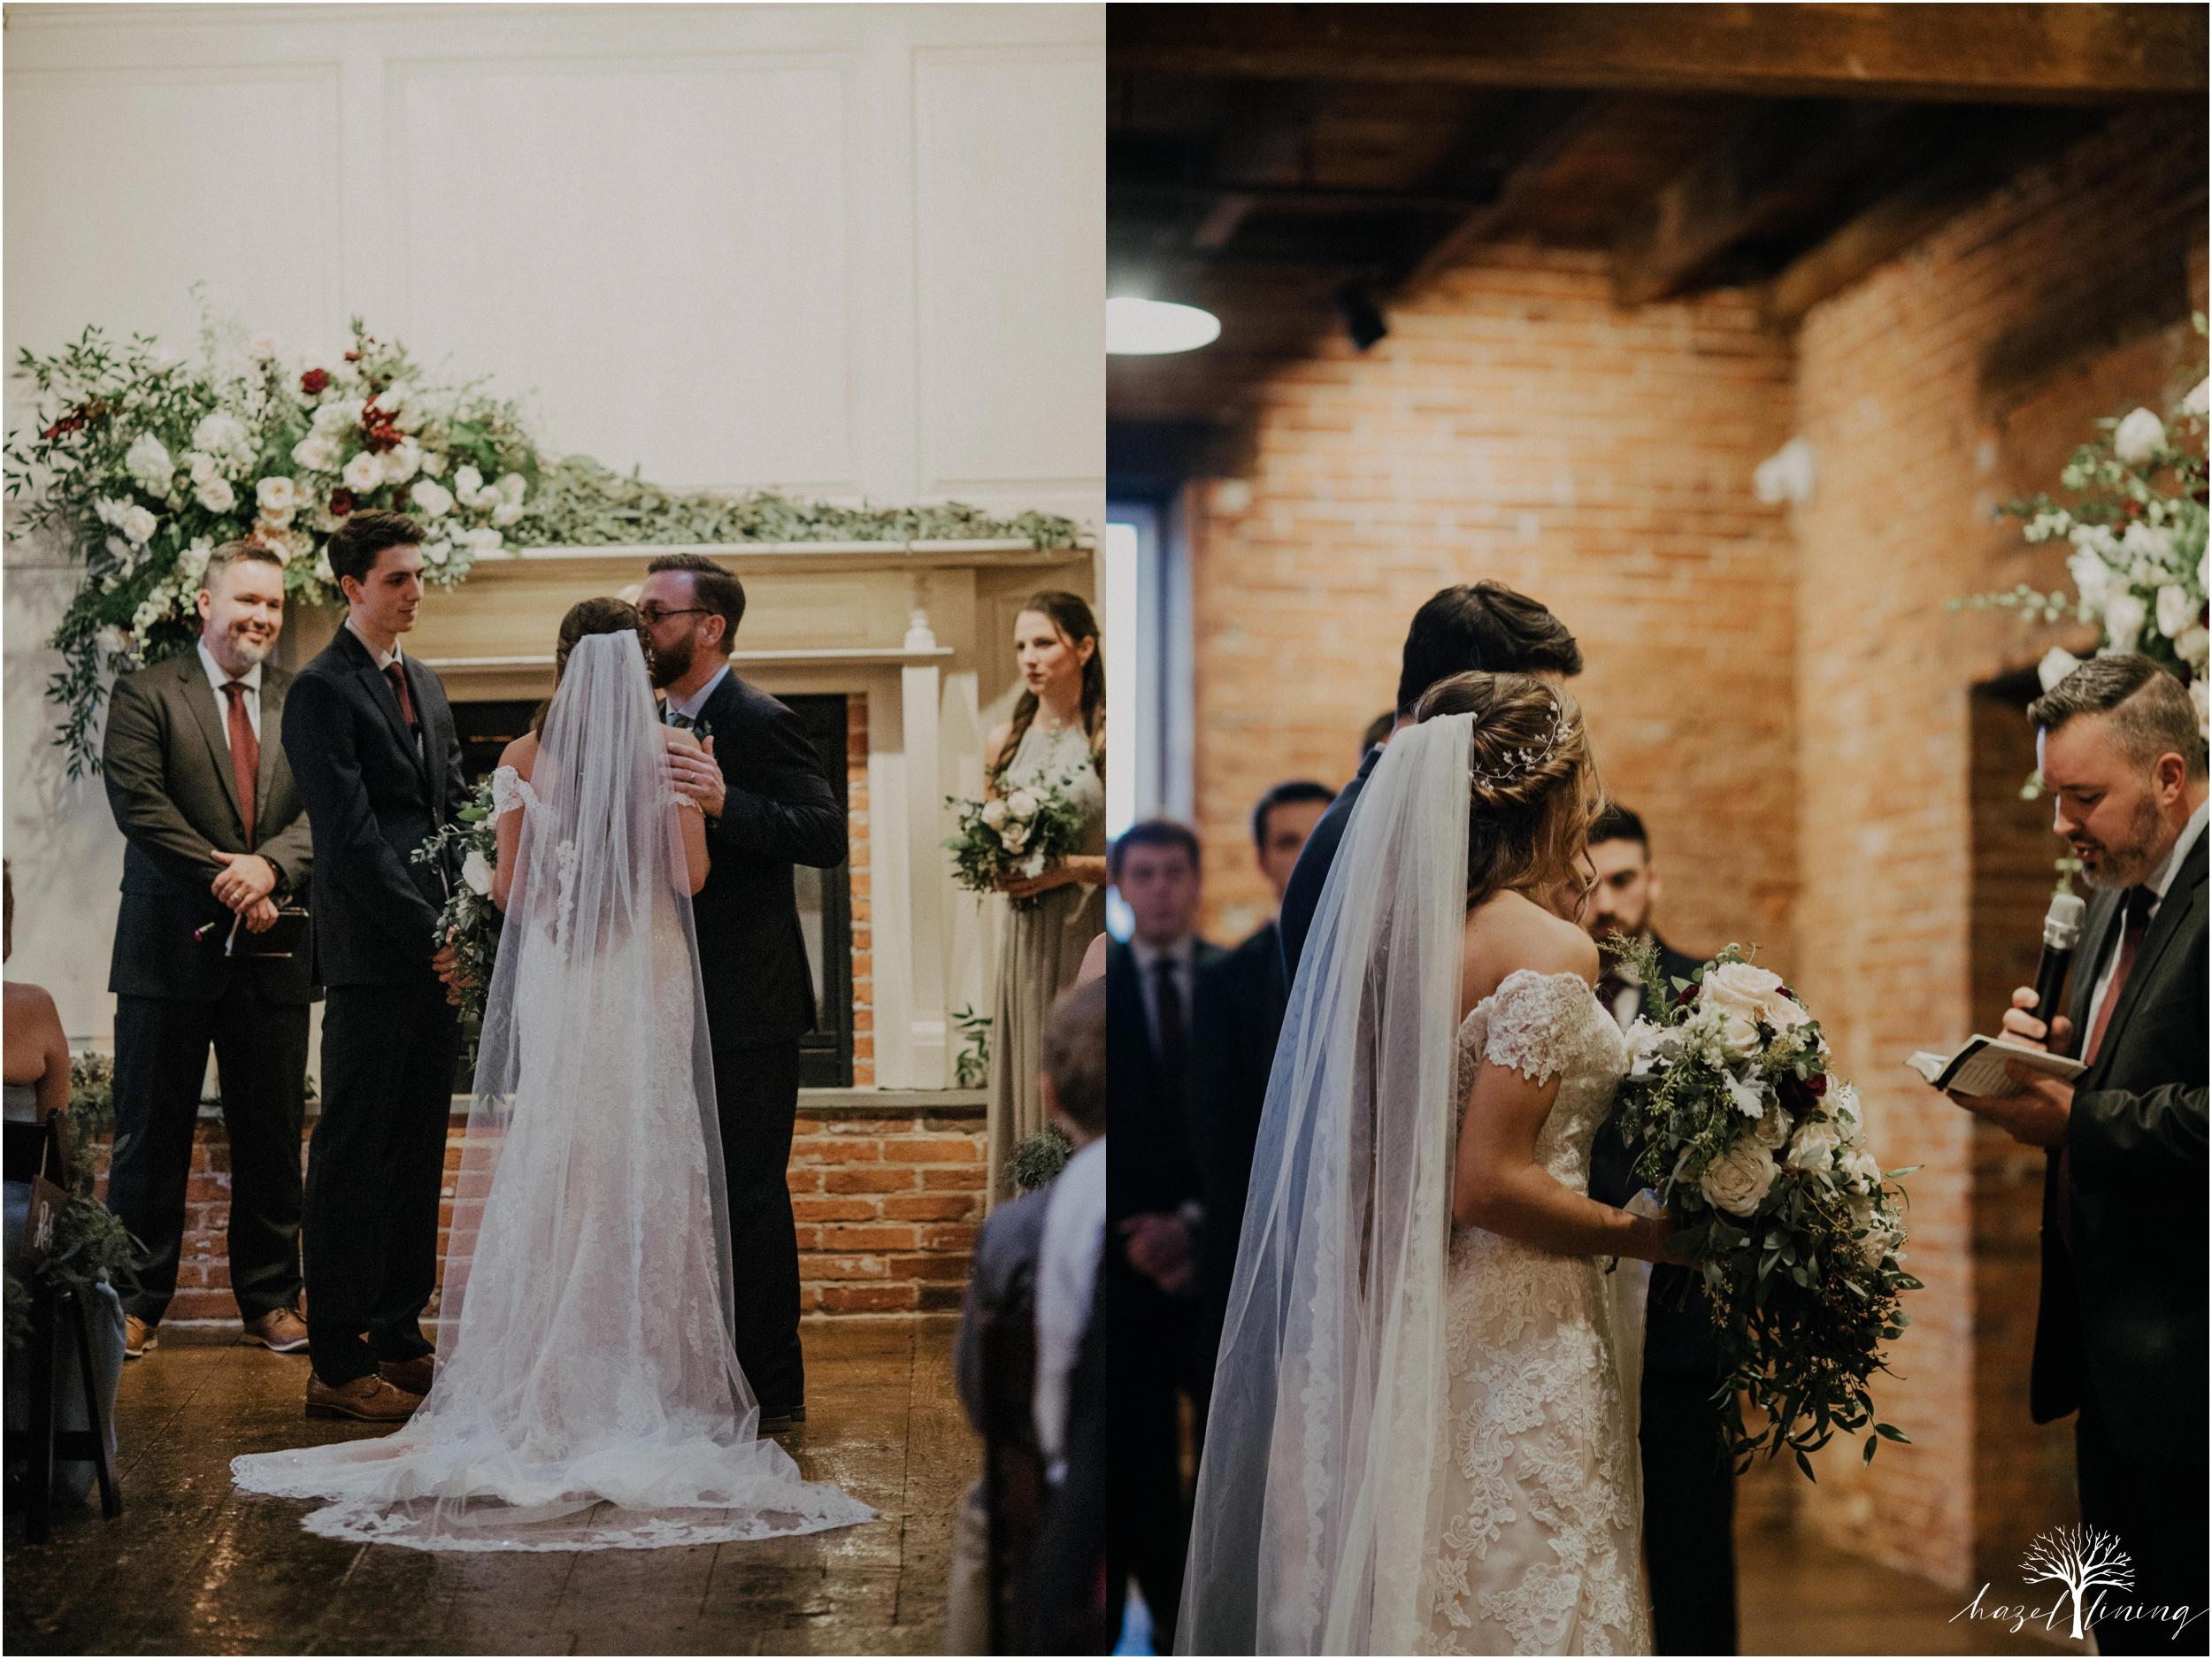 emma-matt-gehringer-the-booking-house-lancaster-manhiem-pennsylvania-winter-wedding_0055.jpg